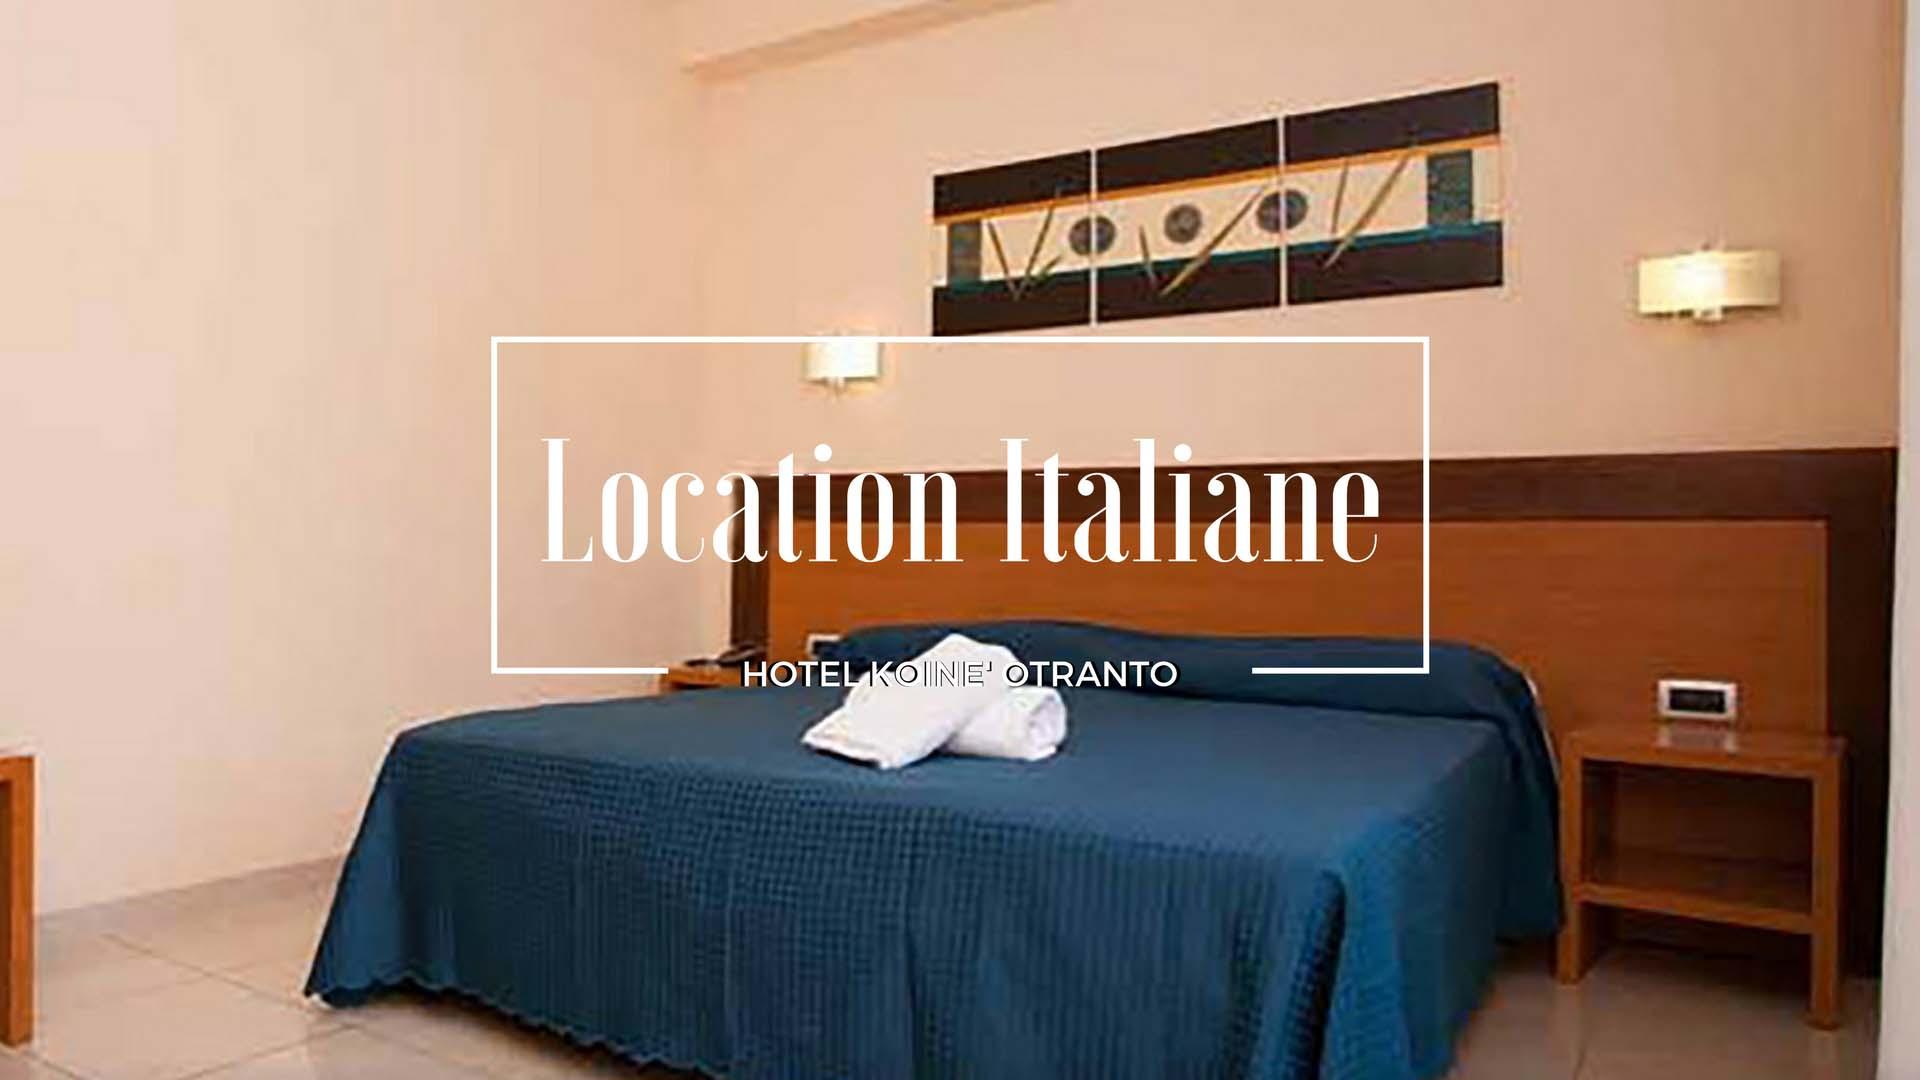 Hotel Koinè Otranto